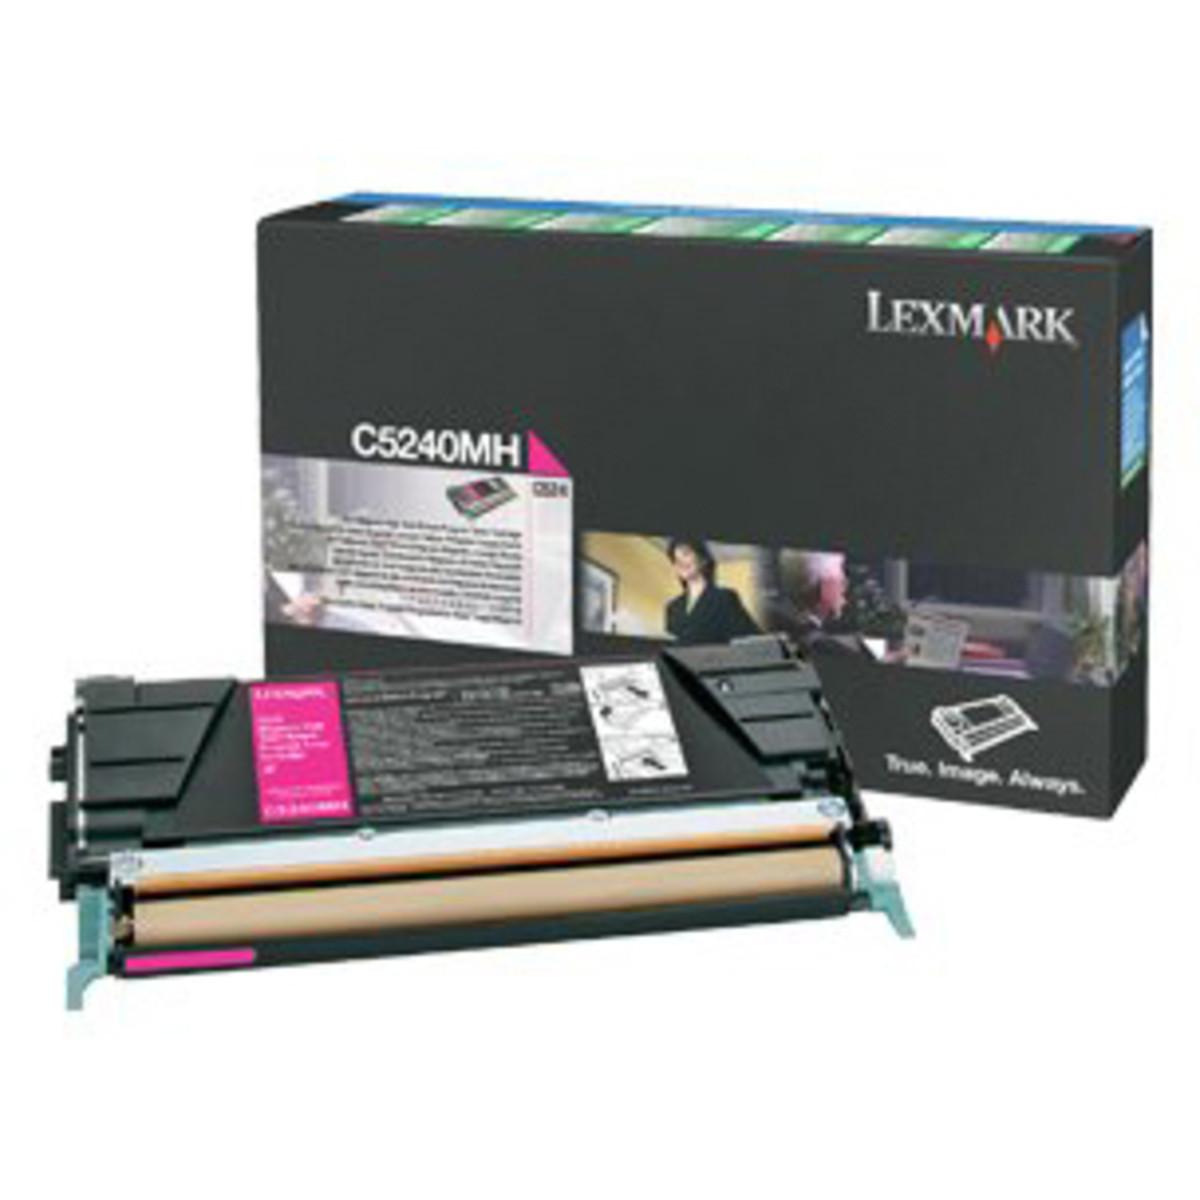 Lexmark C5240MH Magenta Toner Cartridge